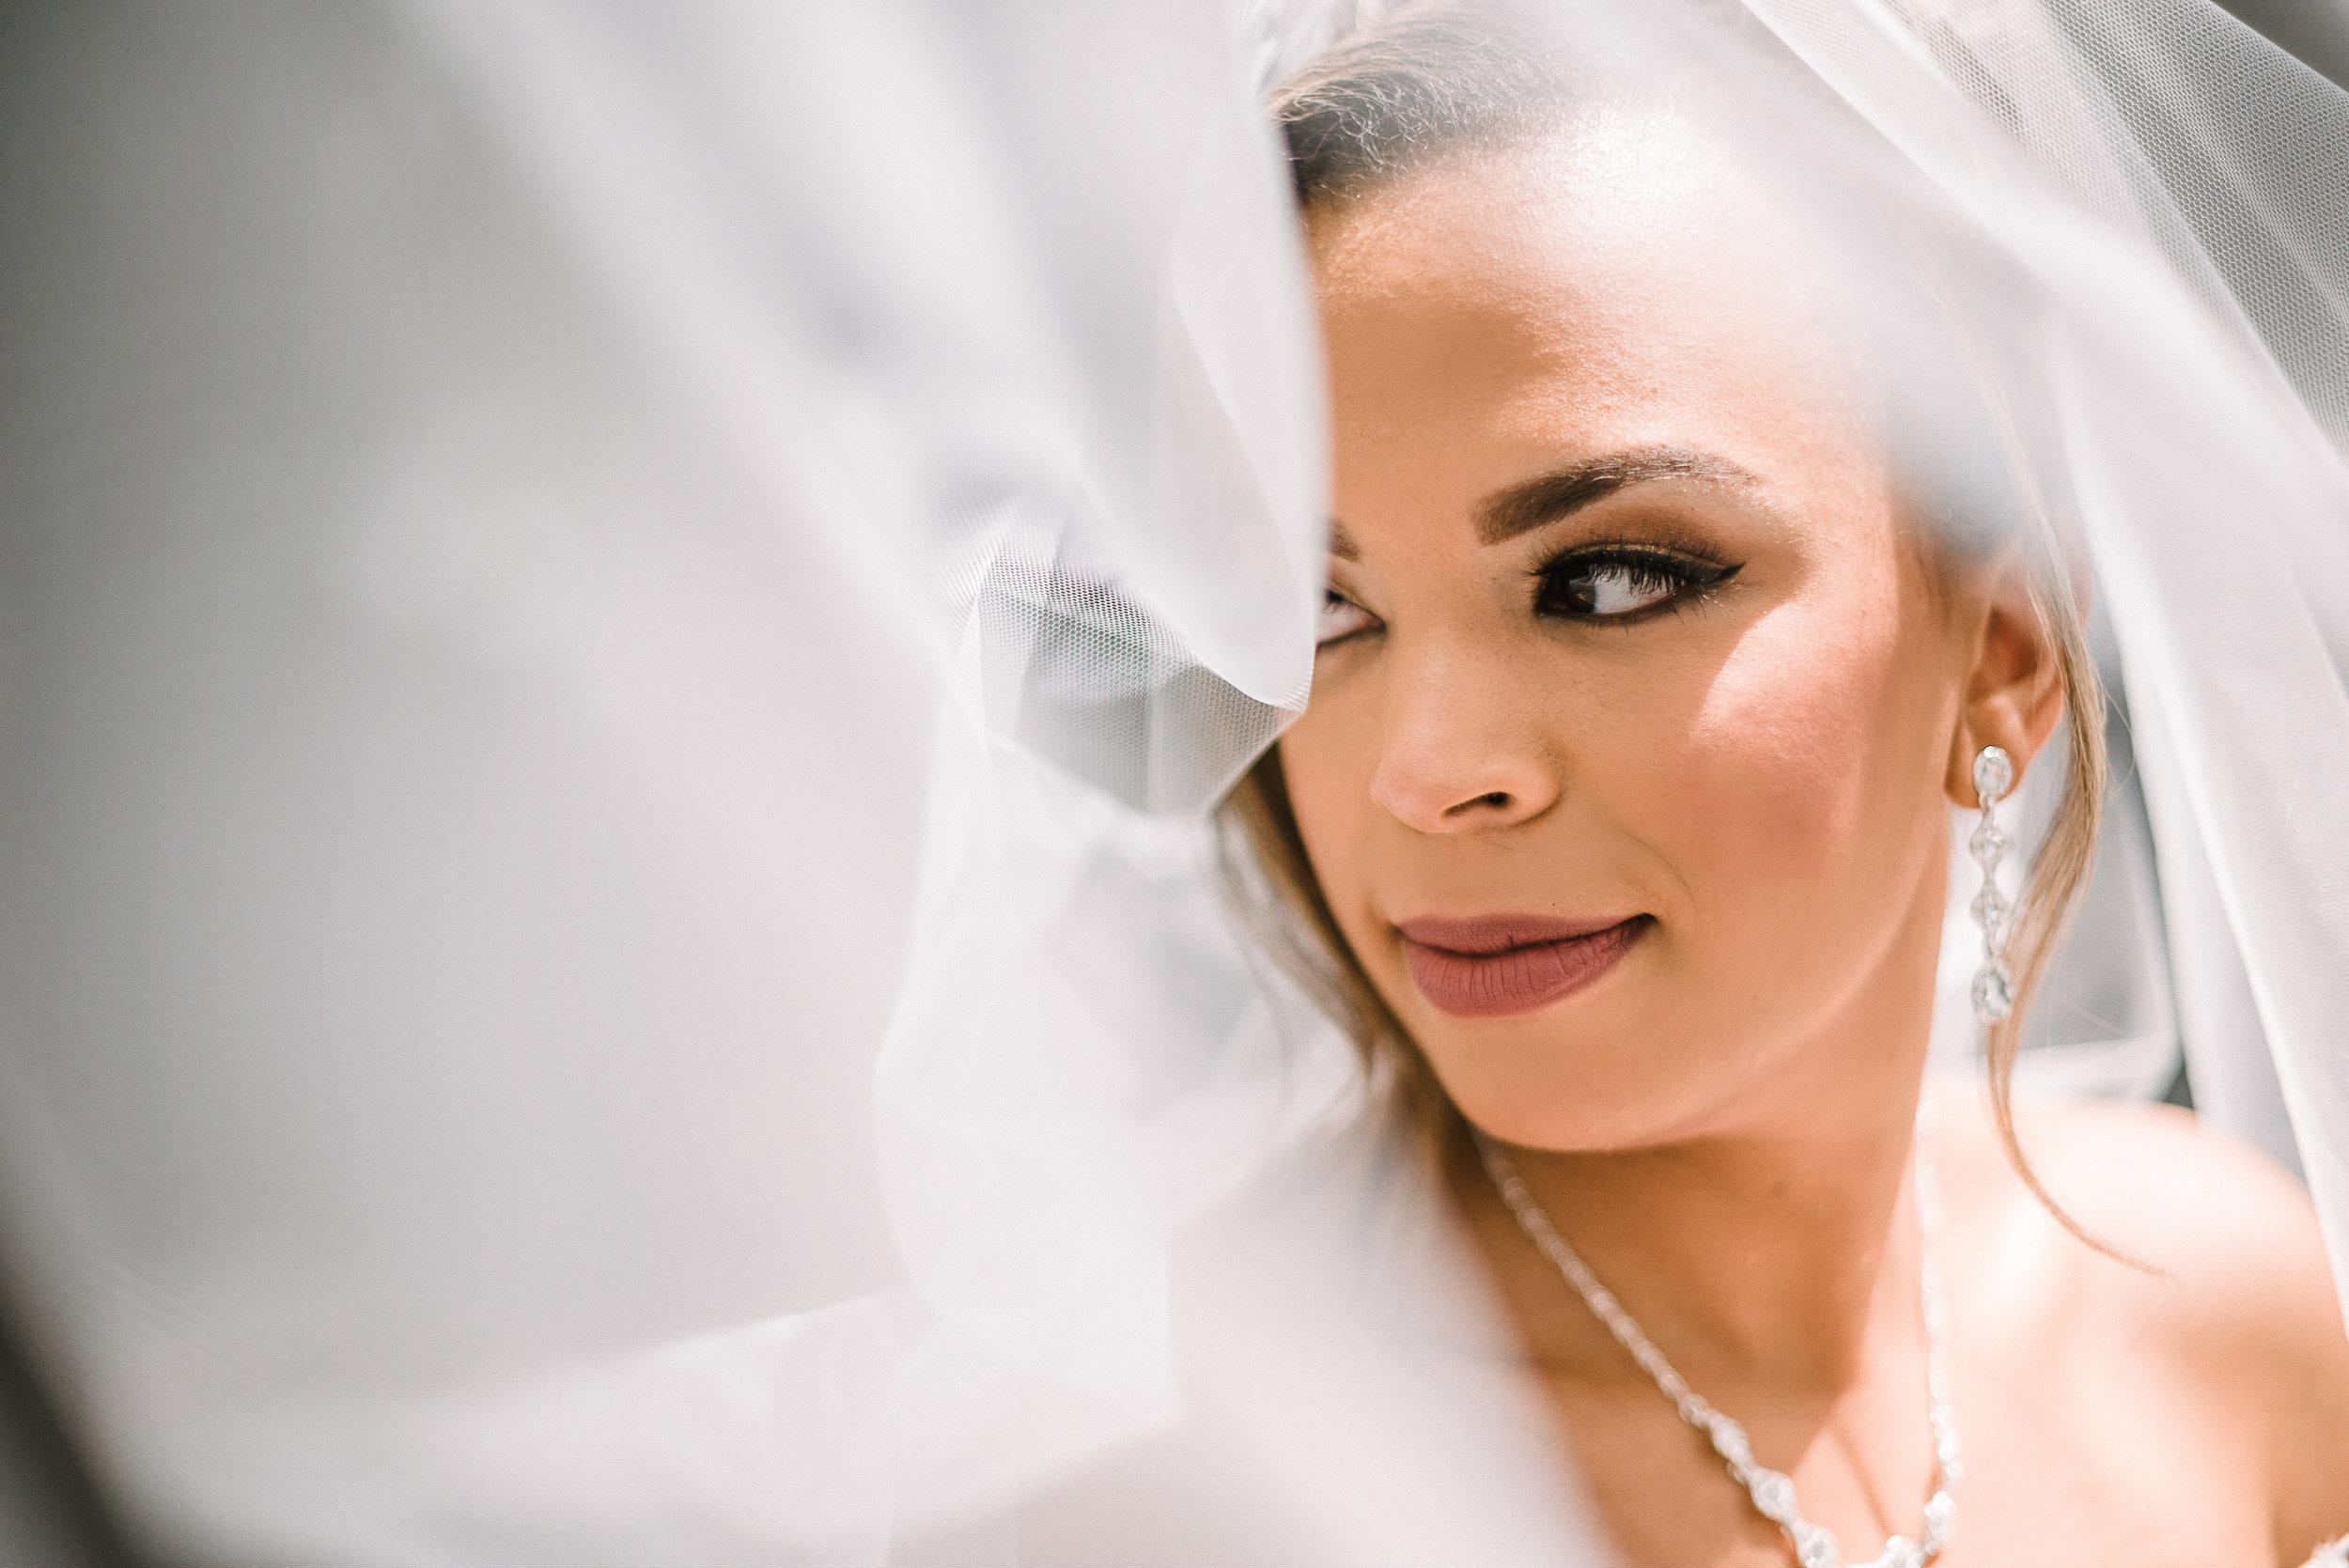 bridal portrait under veil at The Park Hyatt Hotel in Washington DC